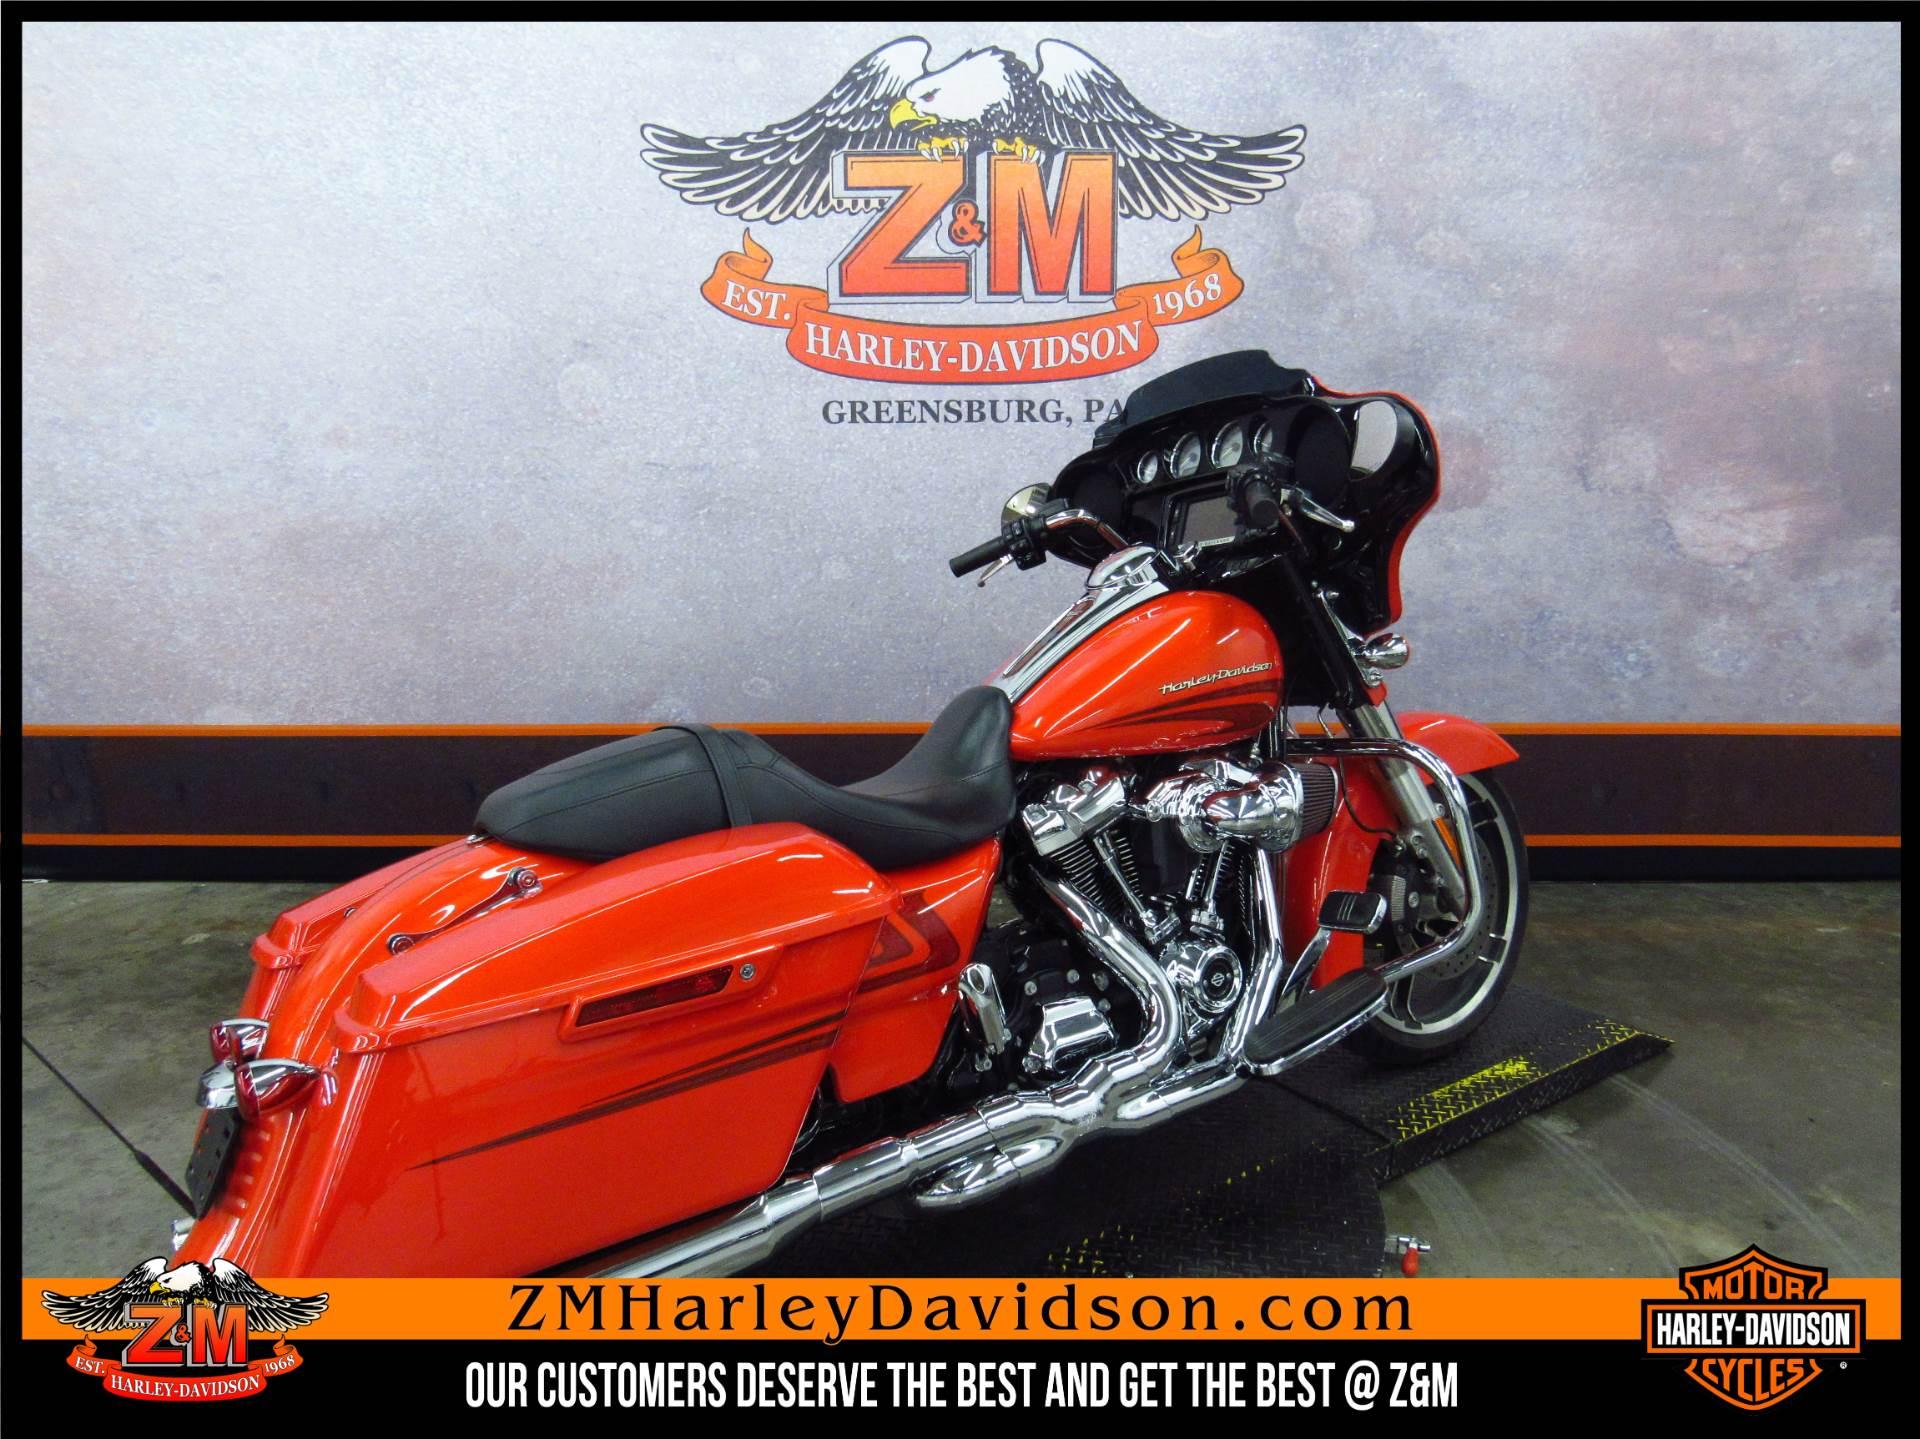 2017 Harley-Davidson Street Glide Special 3